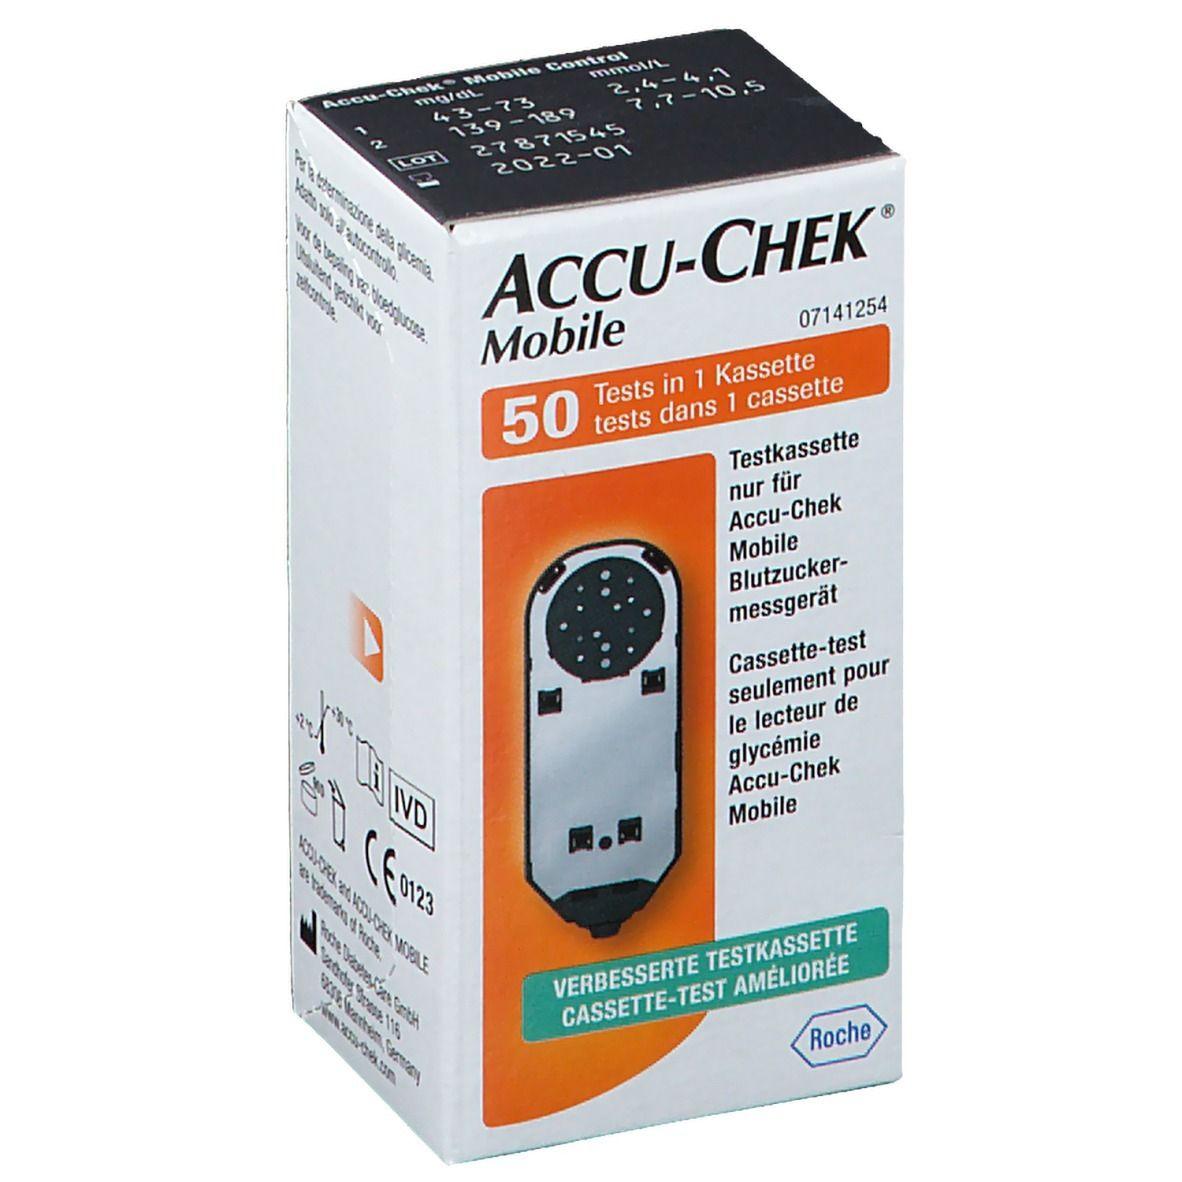 ACCU-CHEK® Mobile Cassette